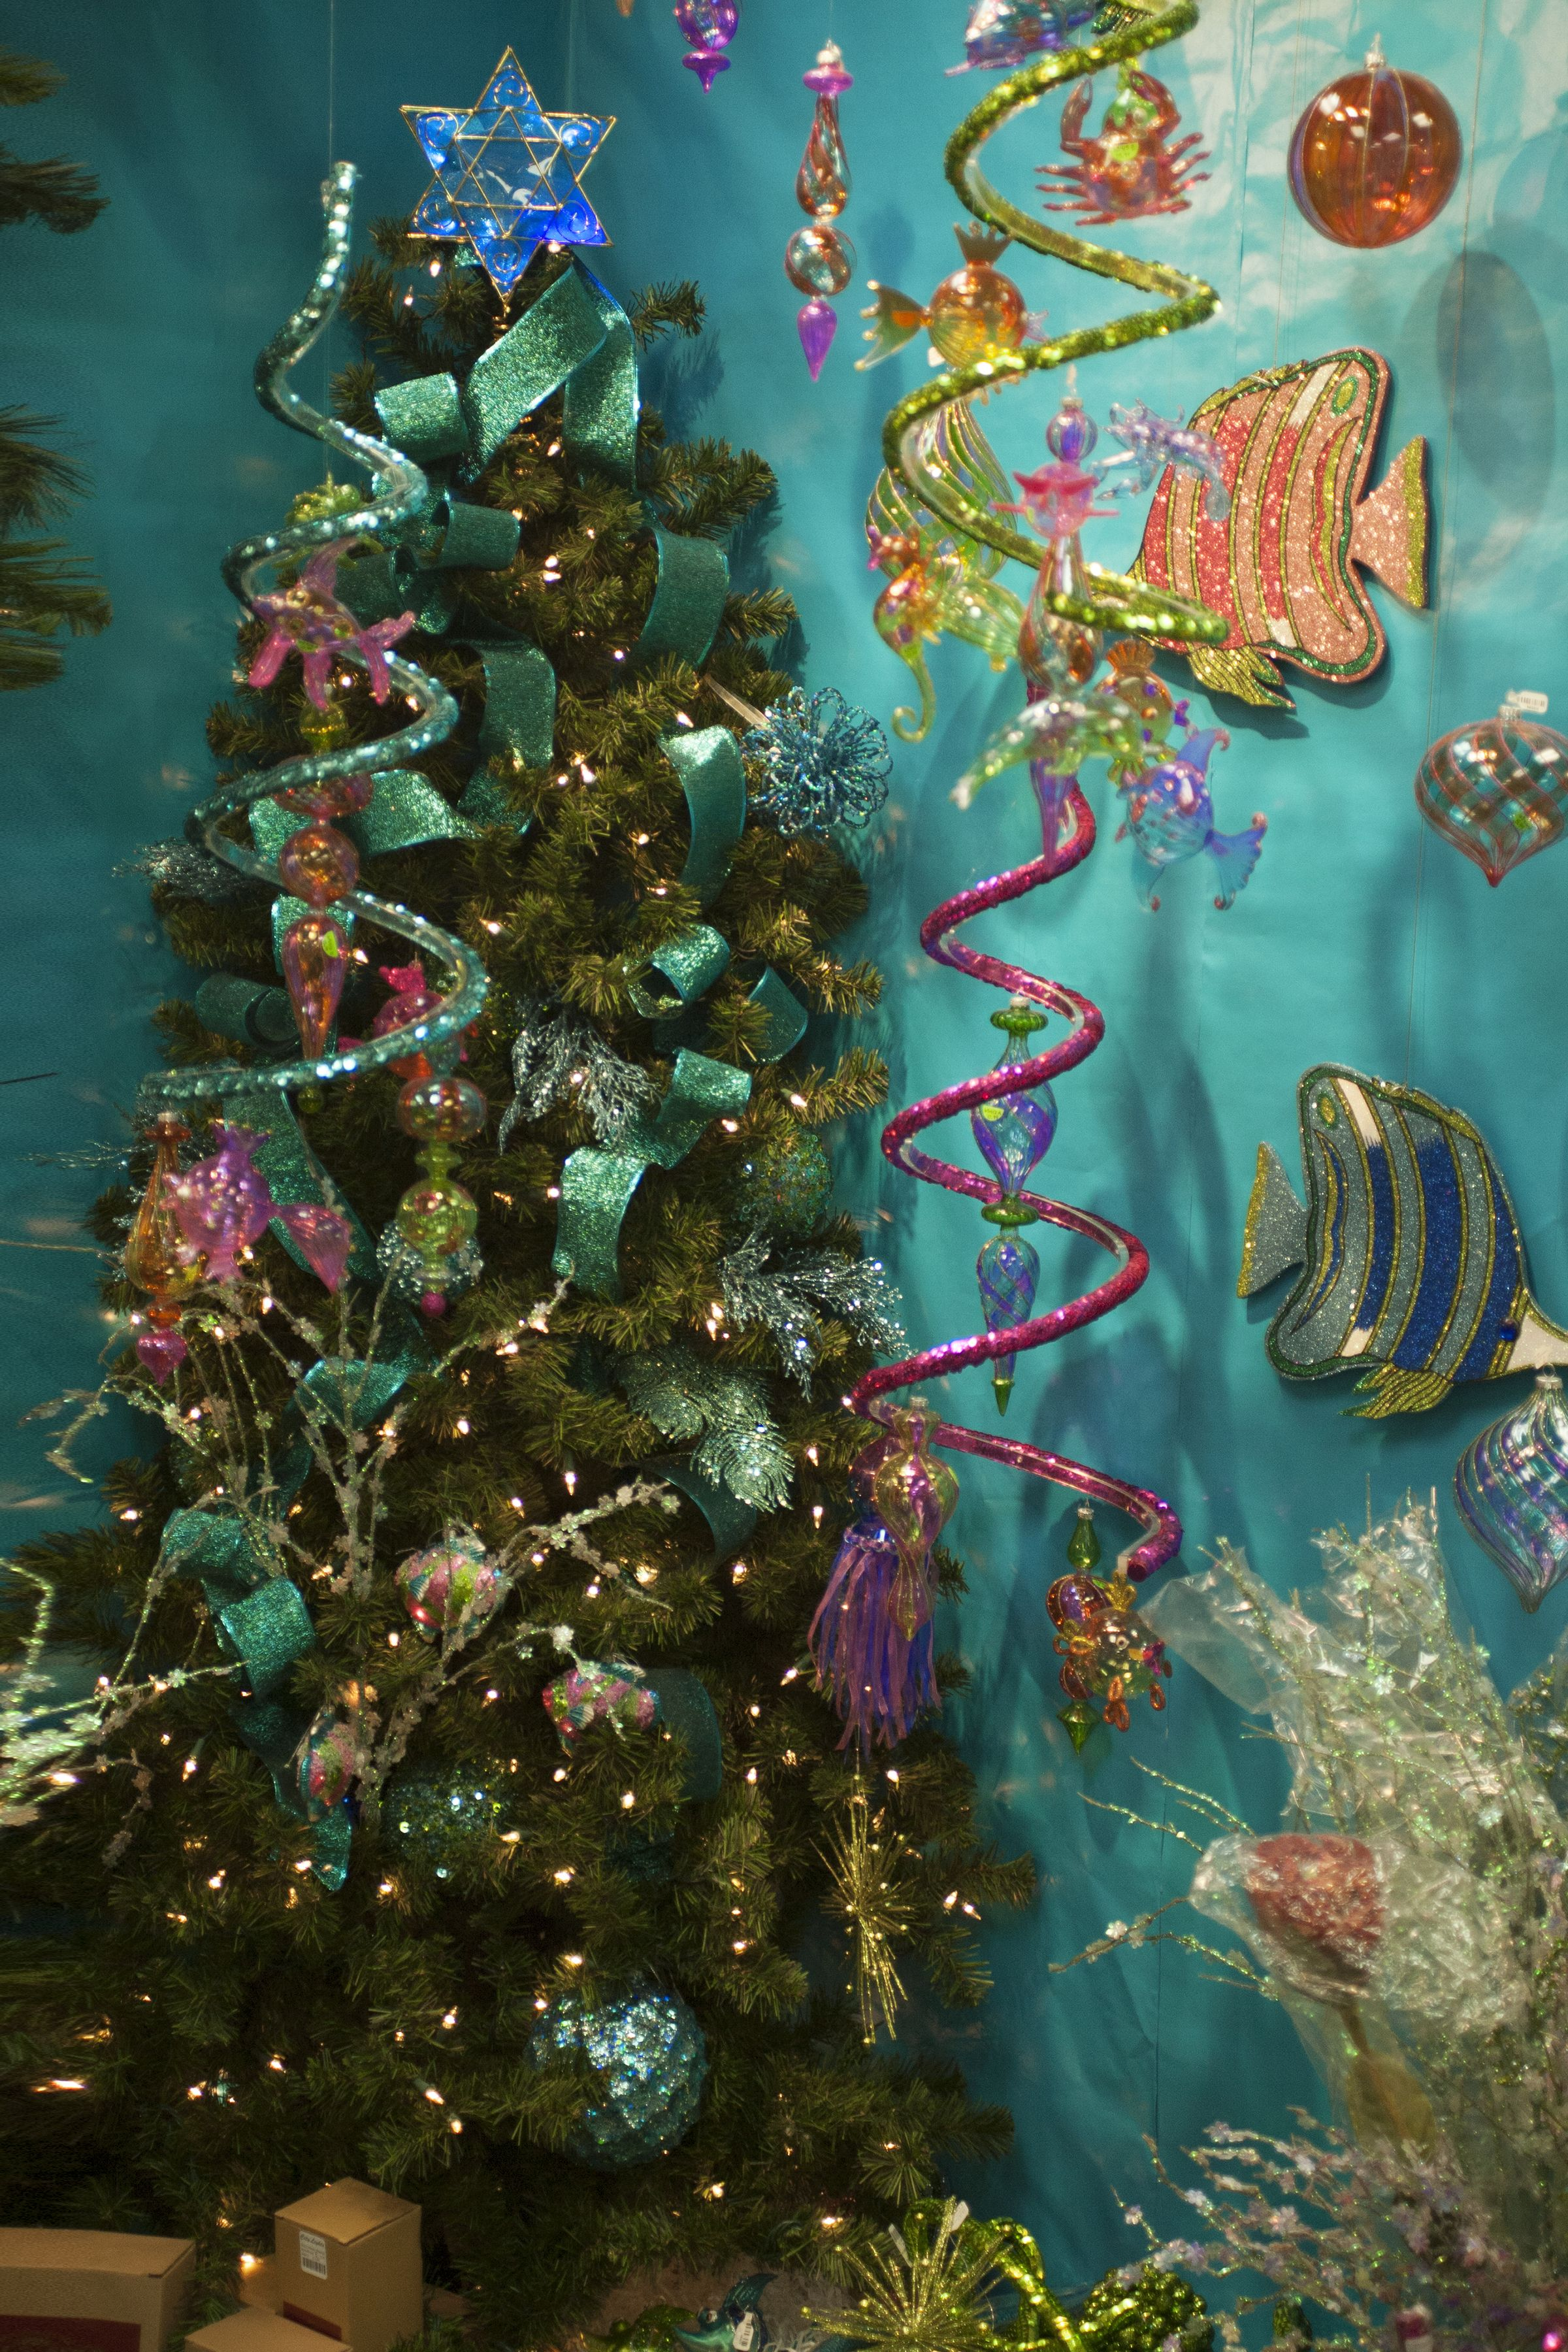 Less Traditional Holiday Decor Create An Underwater Wonderland Hanukkah Christmas Chrismukkah Hanukkah Tree Topper Tree Toppers Interfaith Holidays